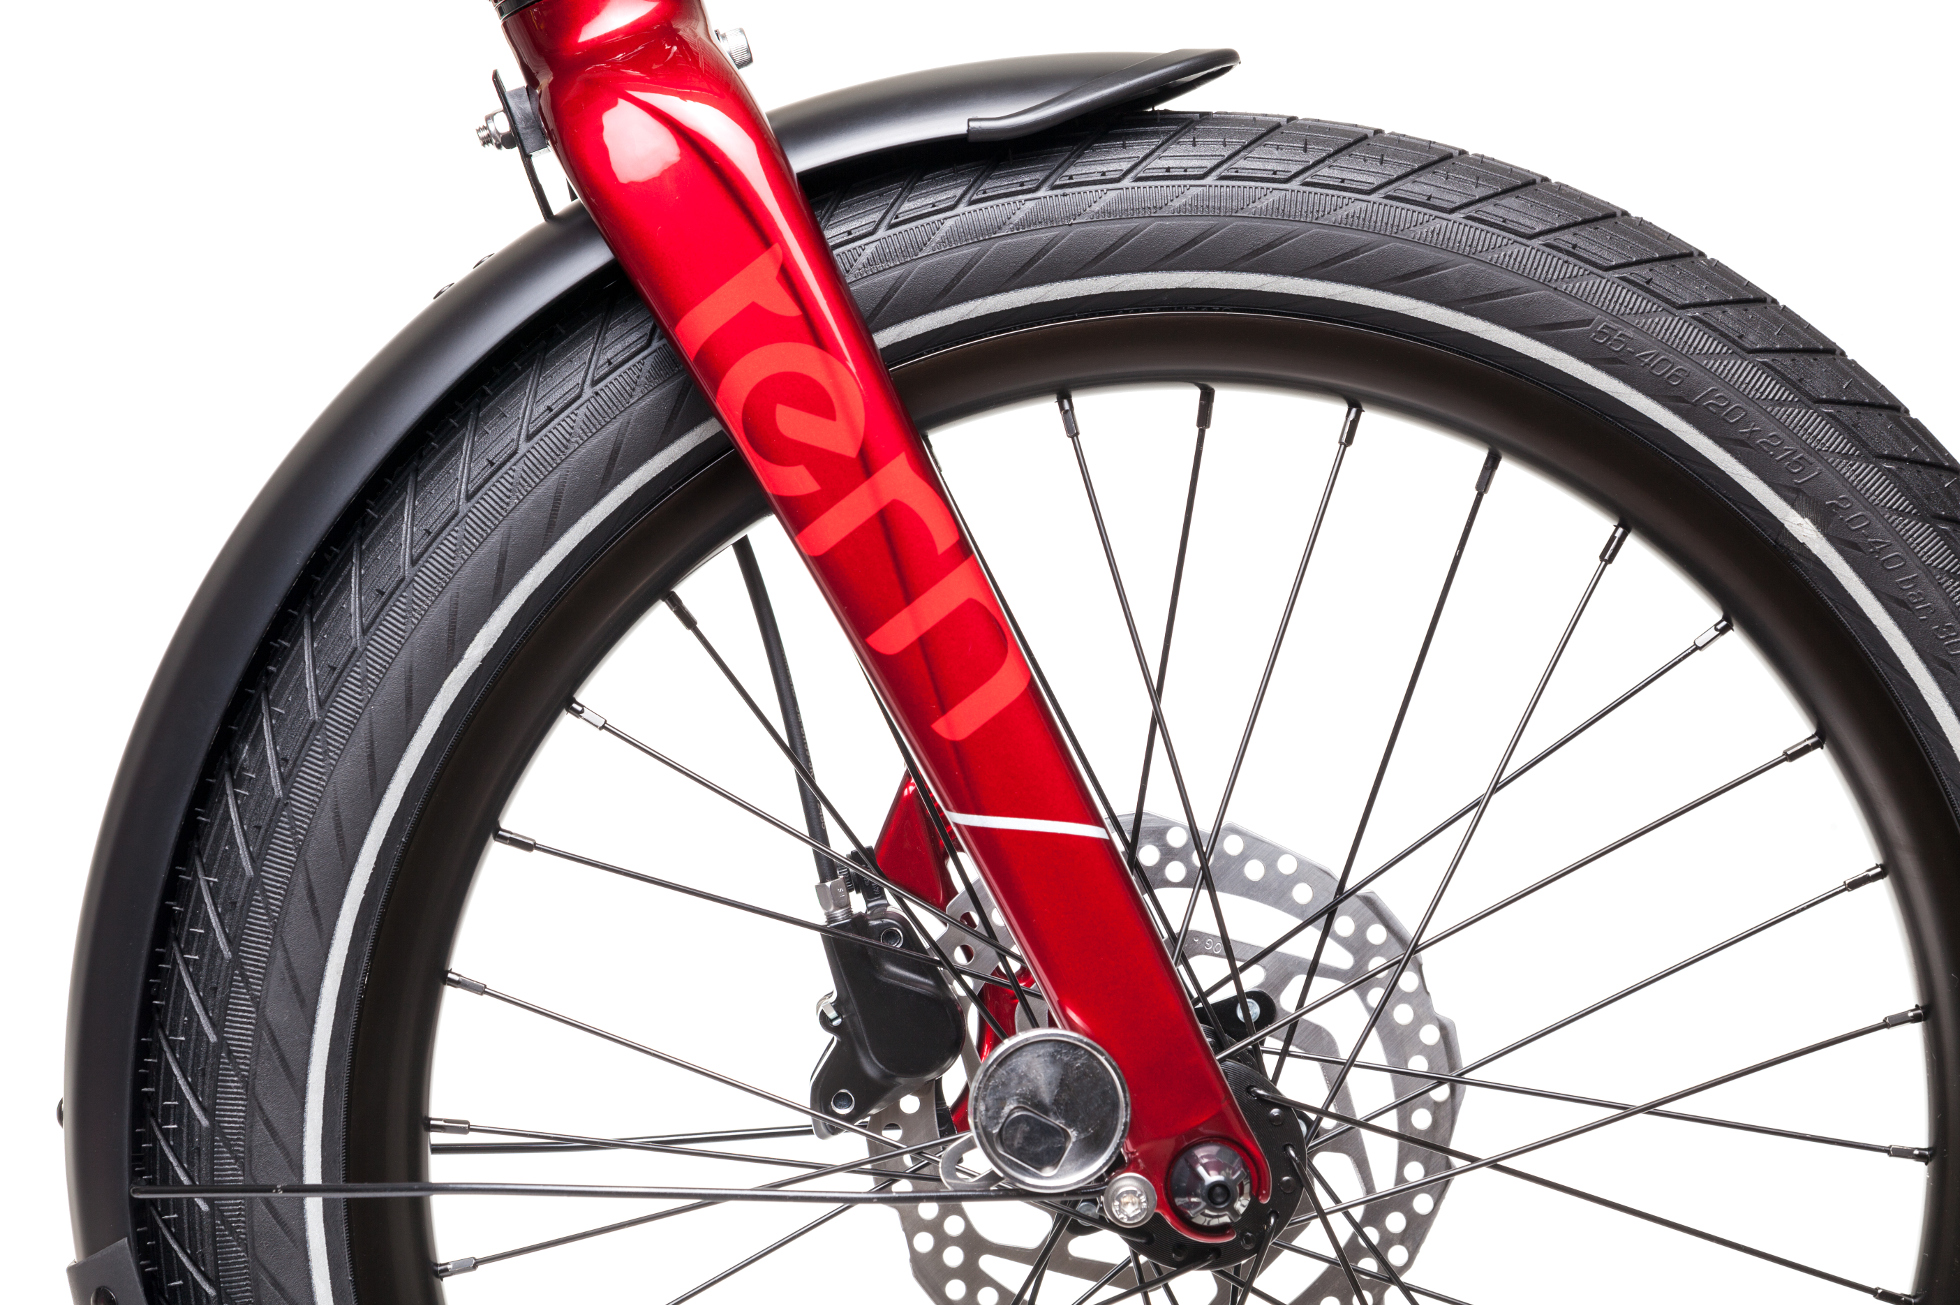 Bici Pieghevole Tern Link P9.Vektron P9 Tern Folding Bikes United States